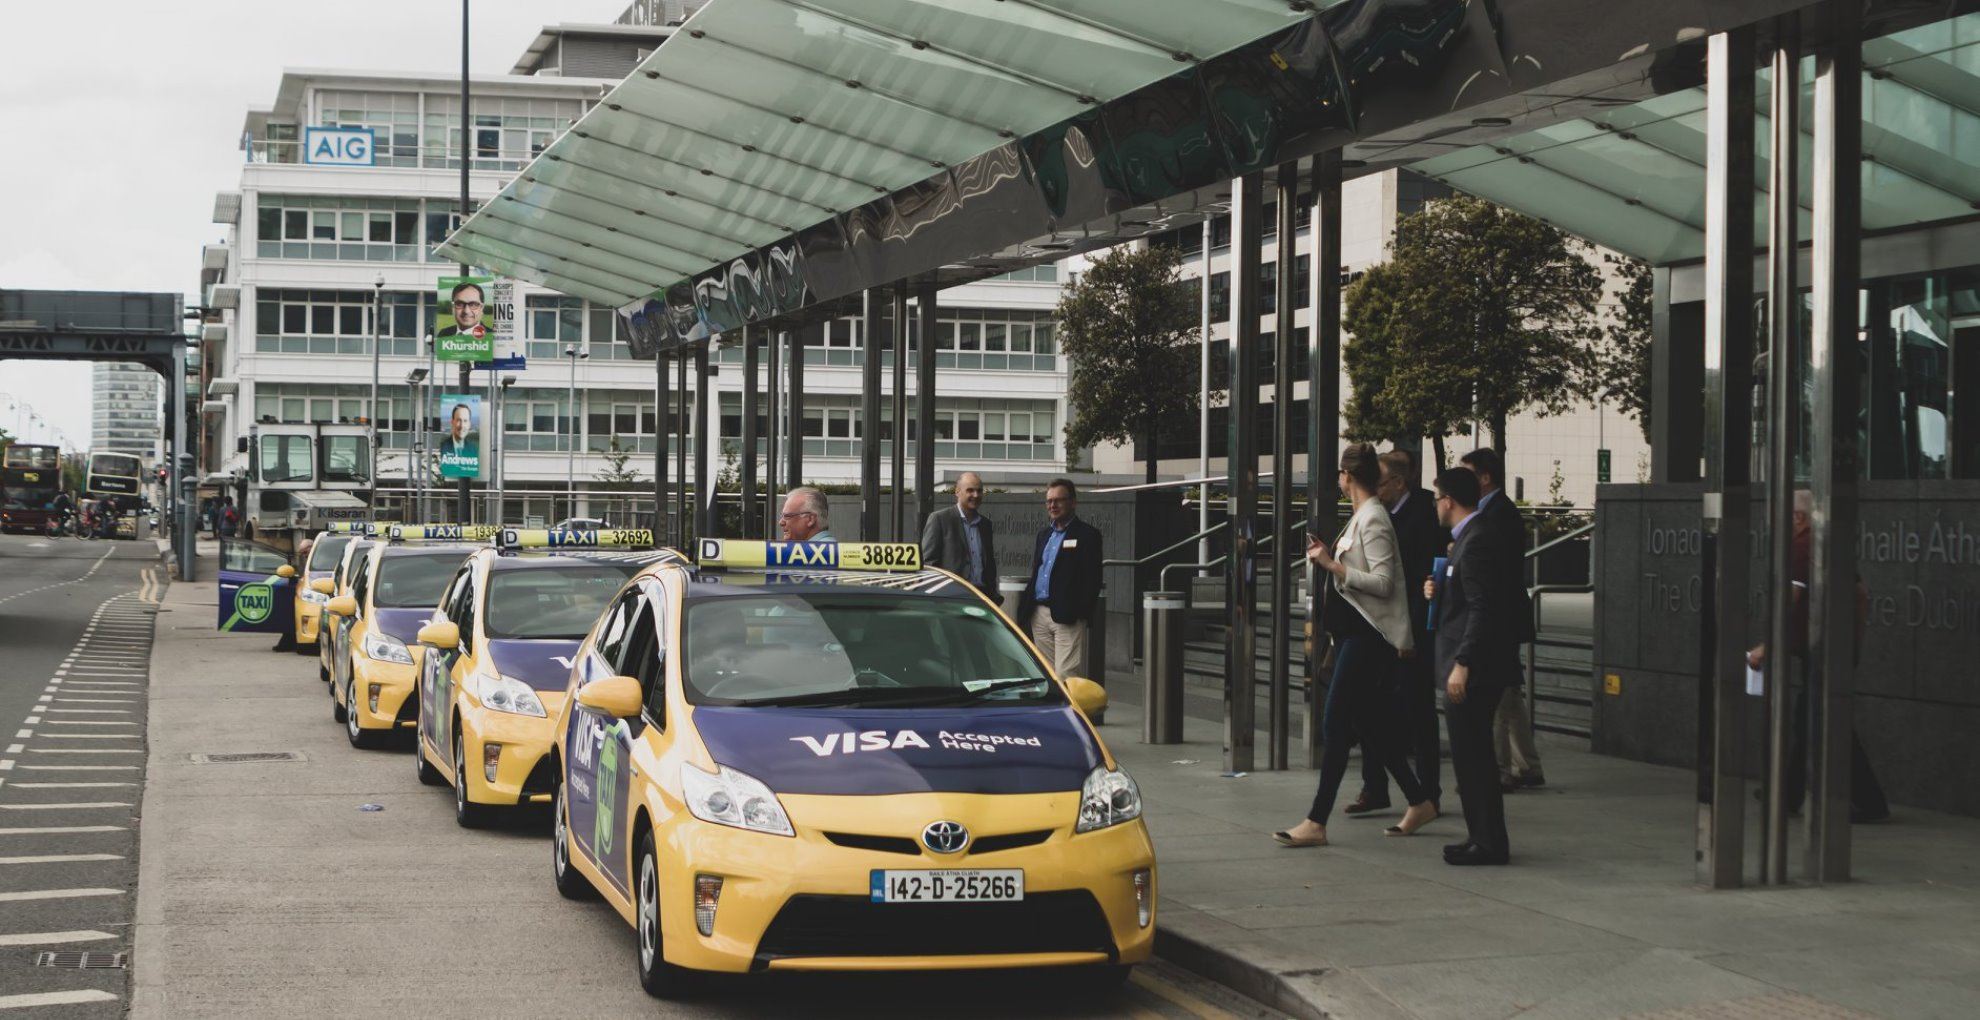 taxi ads convention center dublin